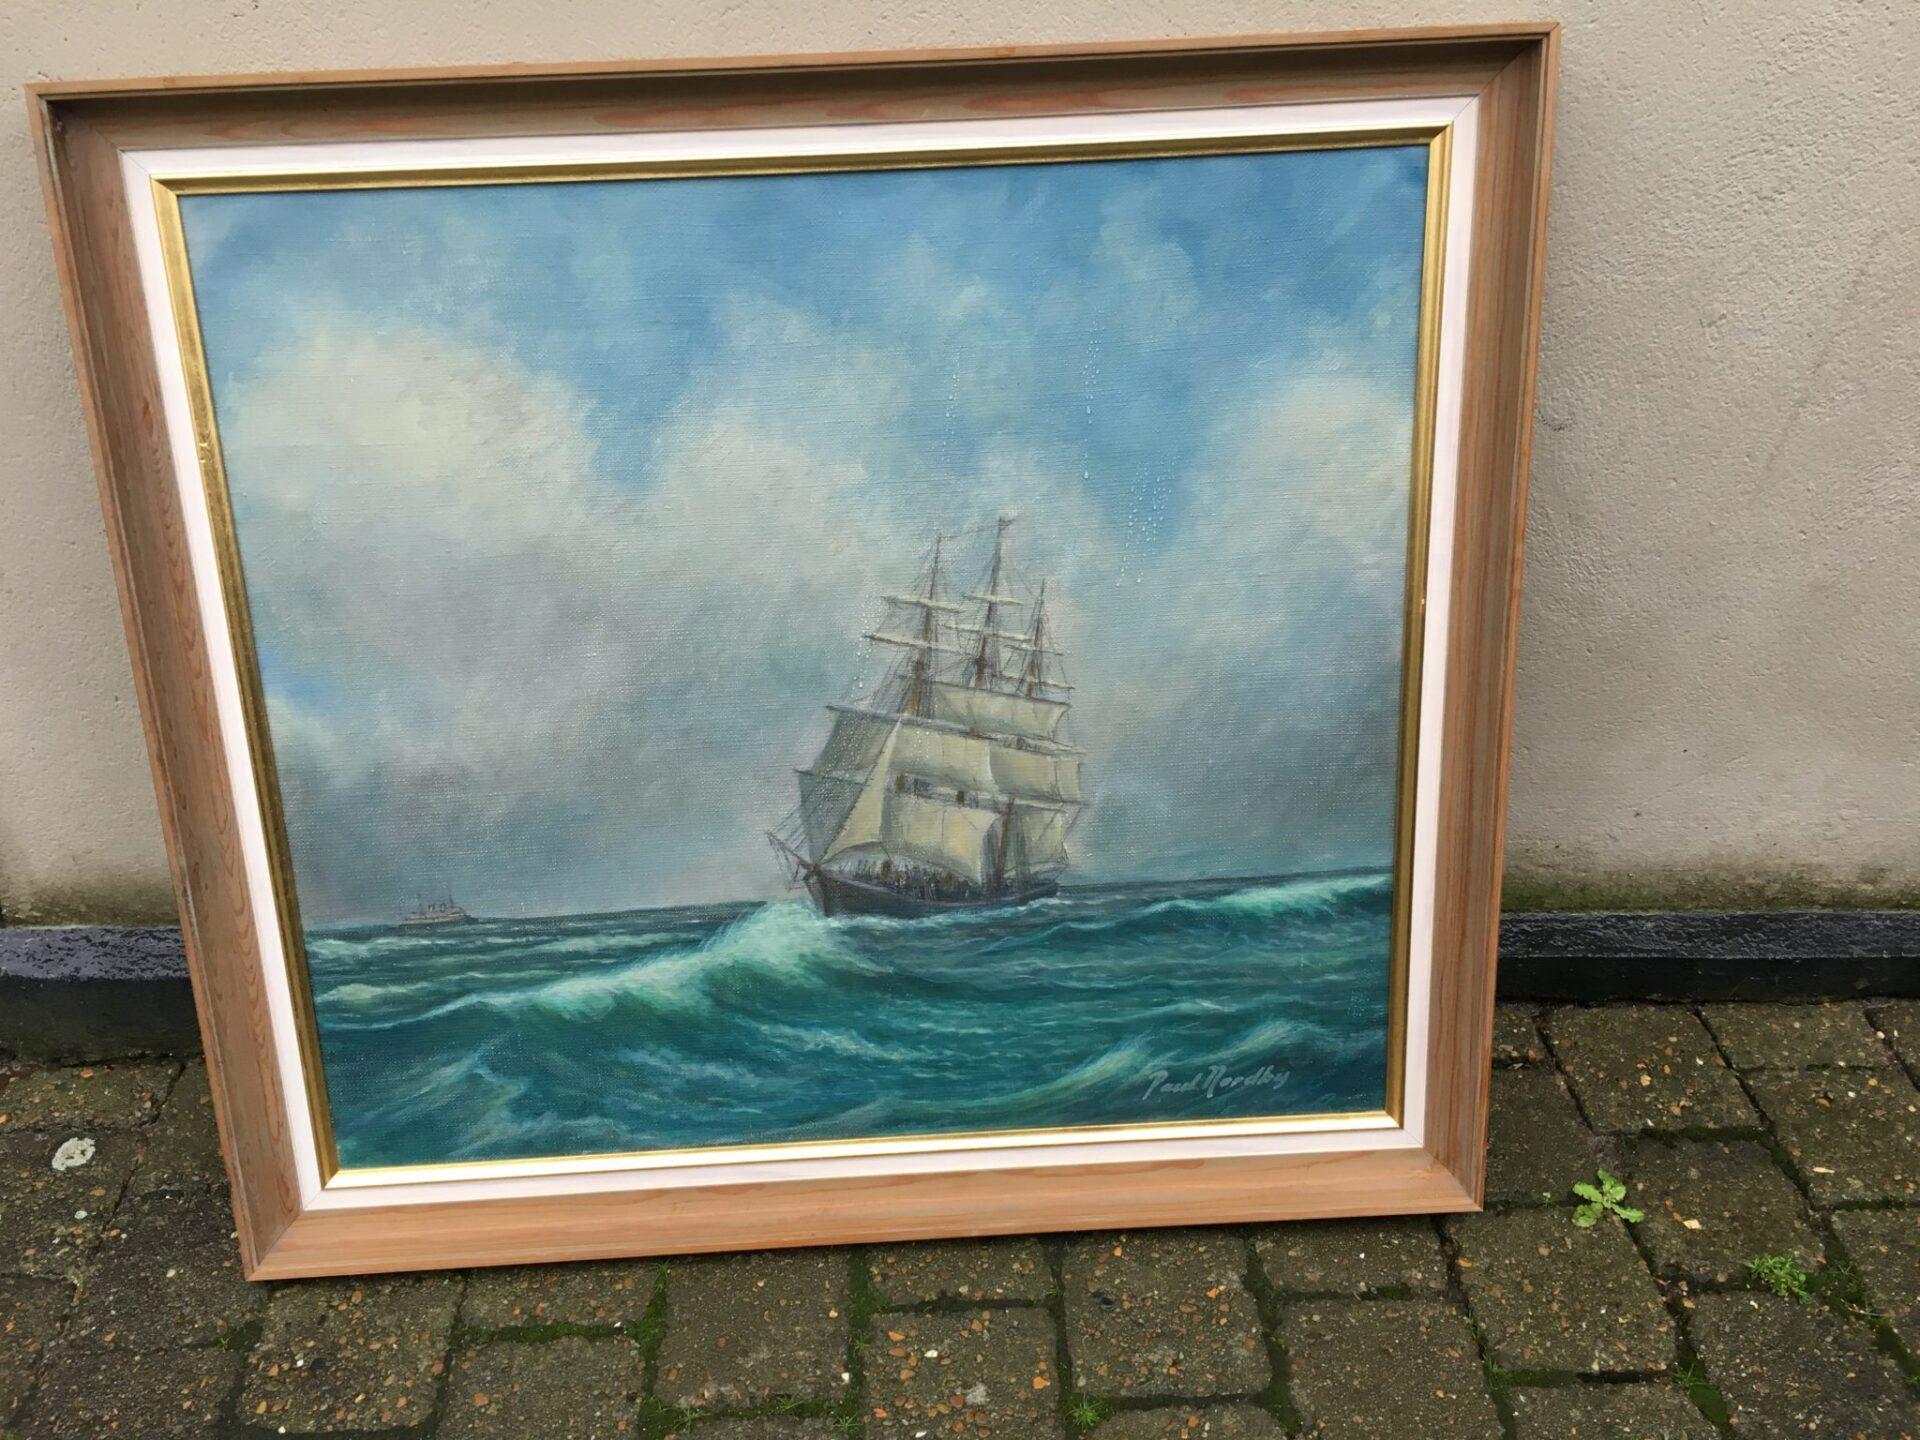 Marine maleri sign Poul Nordby, pris 200kr